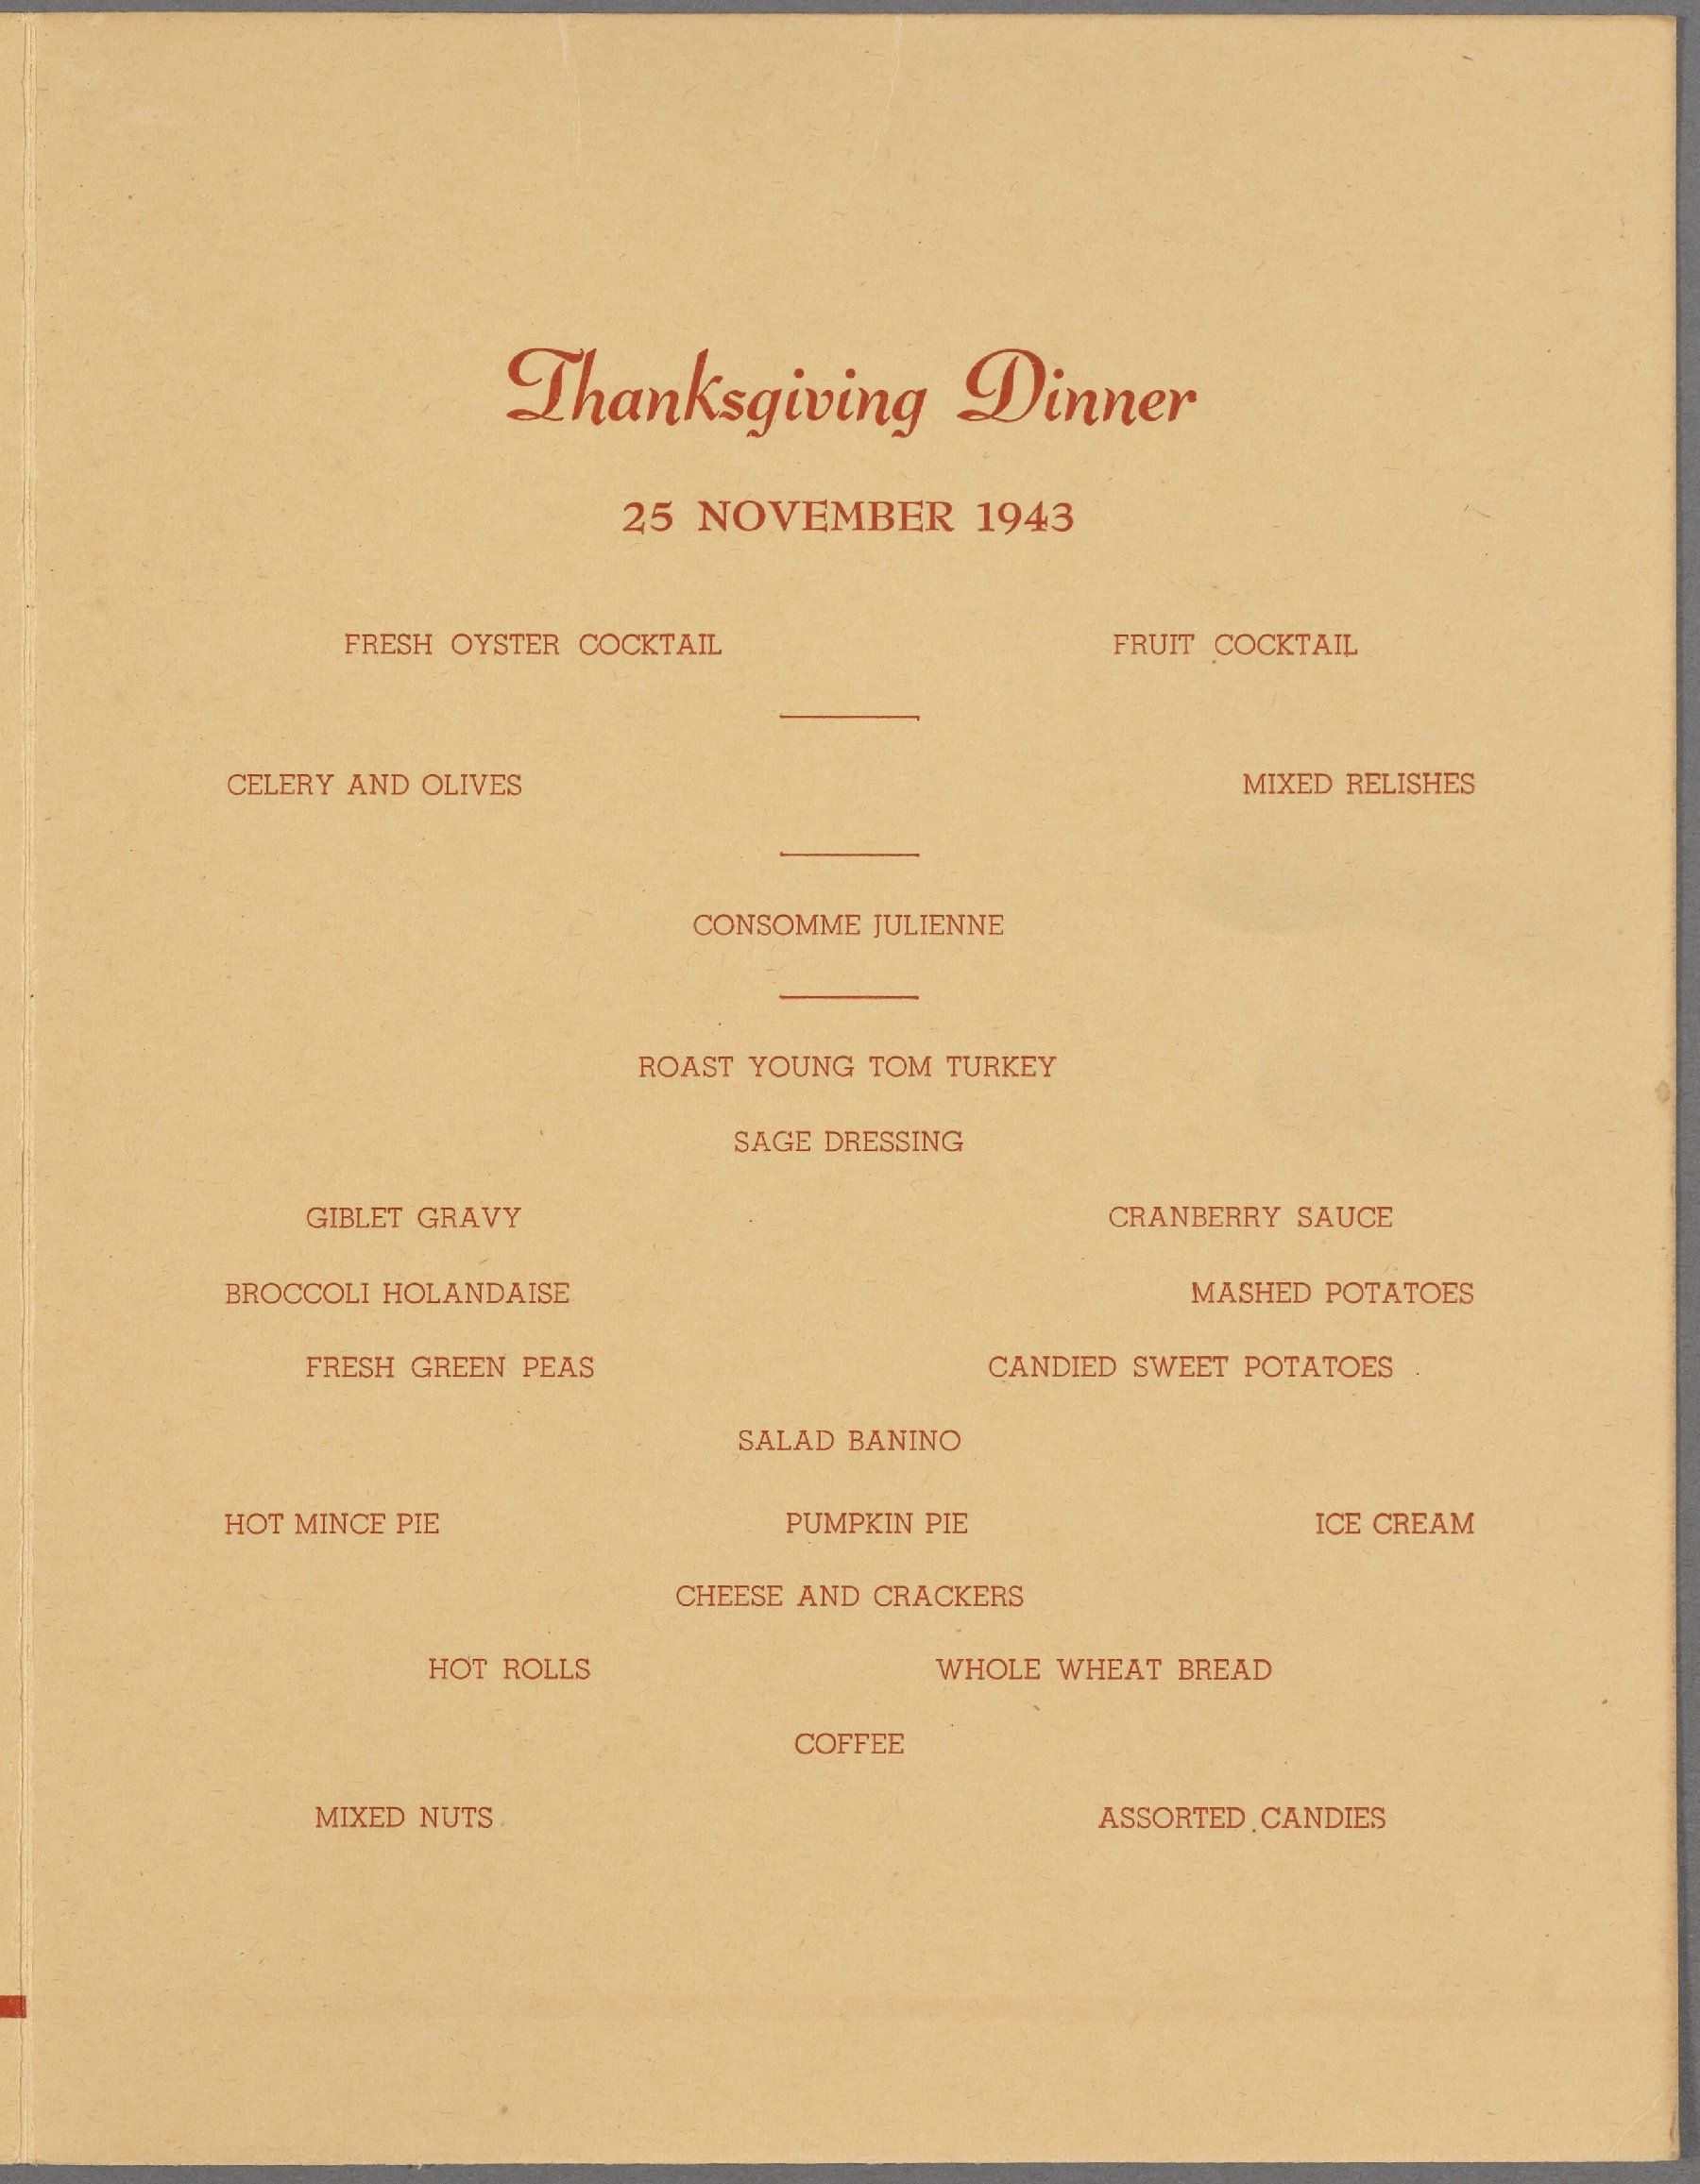 Menu Thanksgiving Dinner  Officers Mess Camp Myles